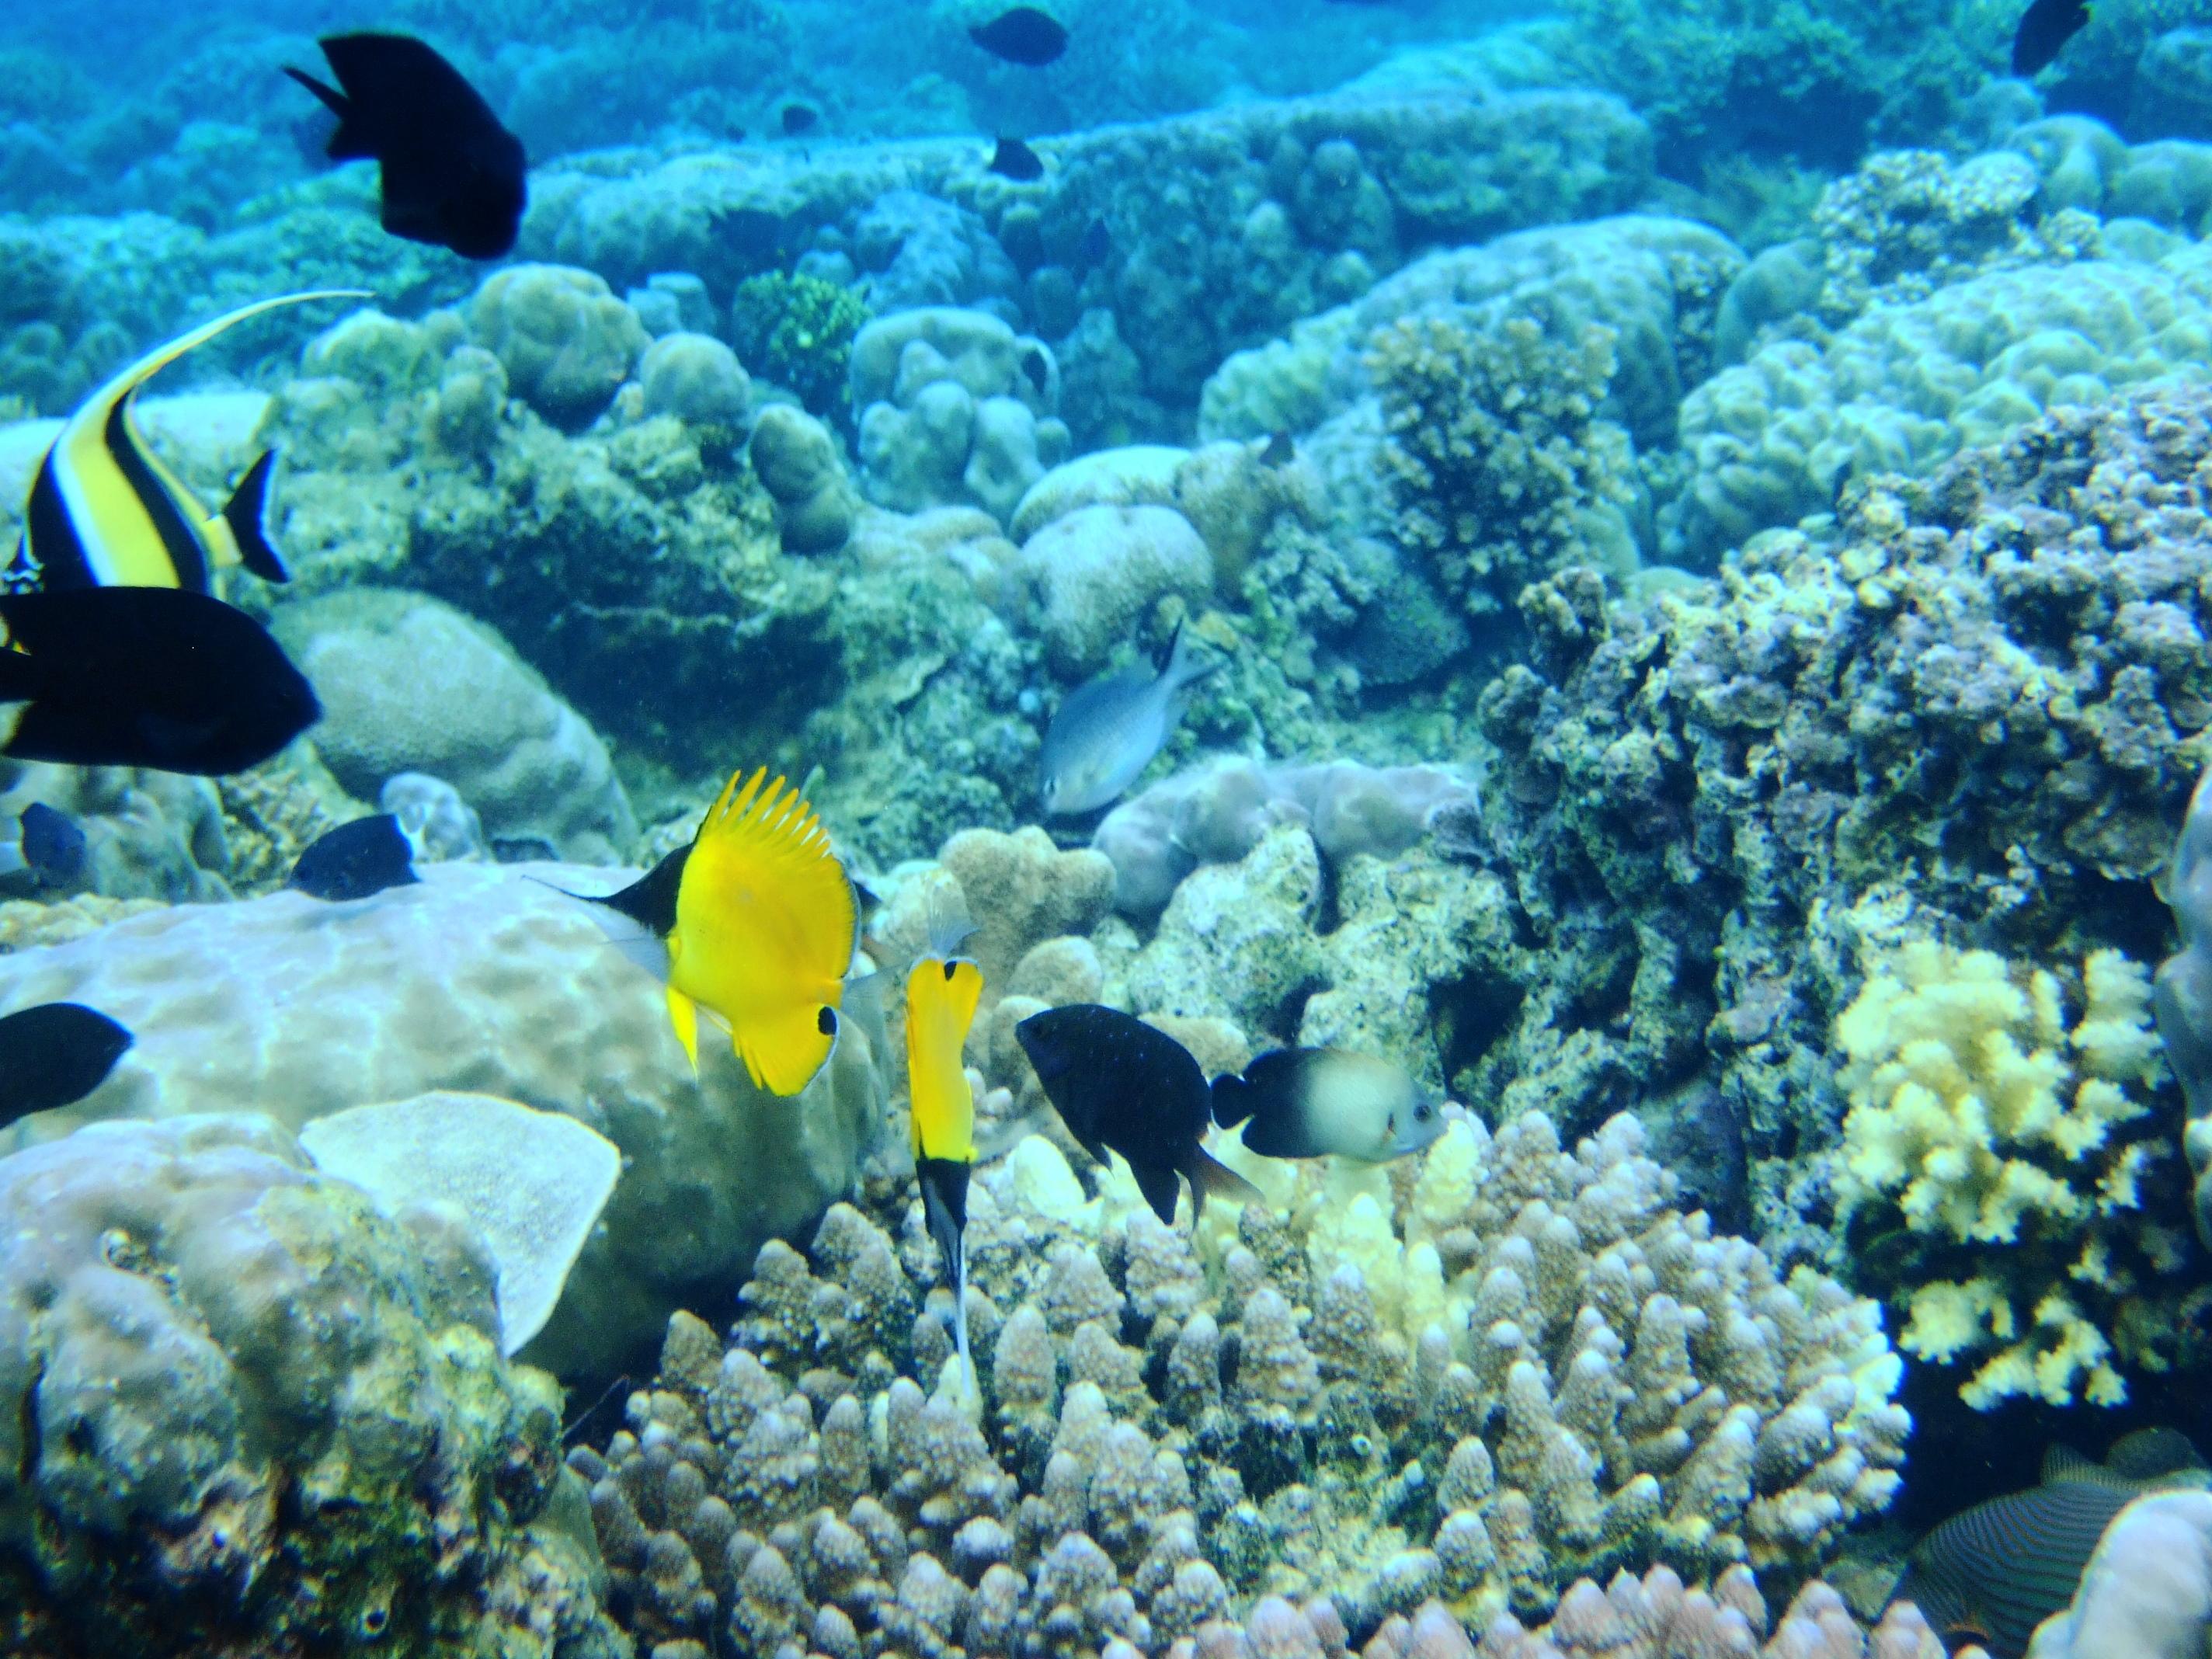 Marine park, Malaysia marine park - Top 10 Things to Do in Kota Kinabalu